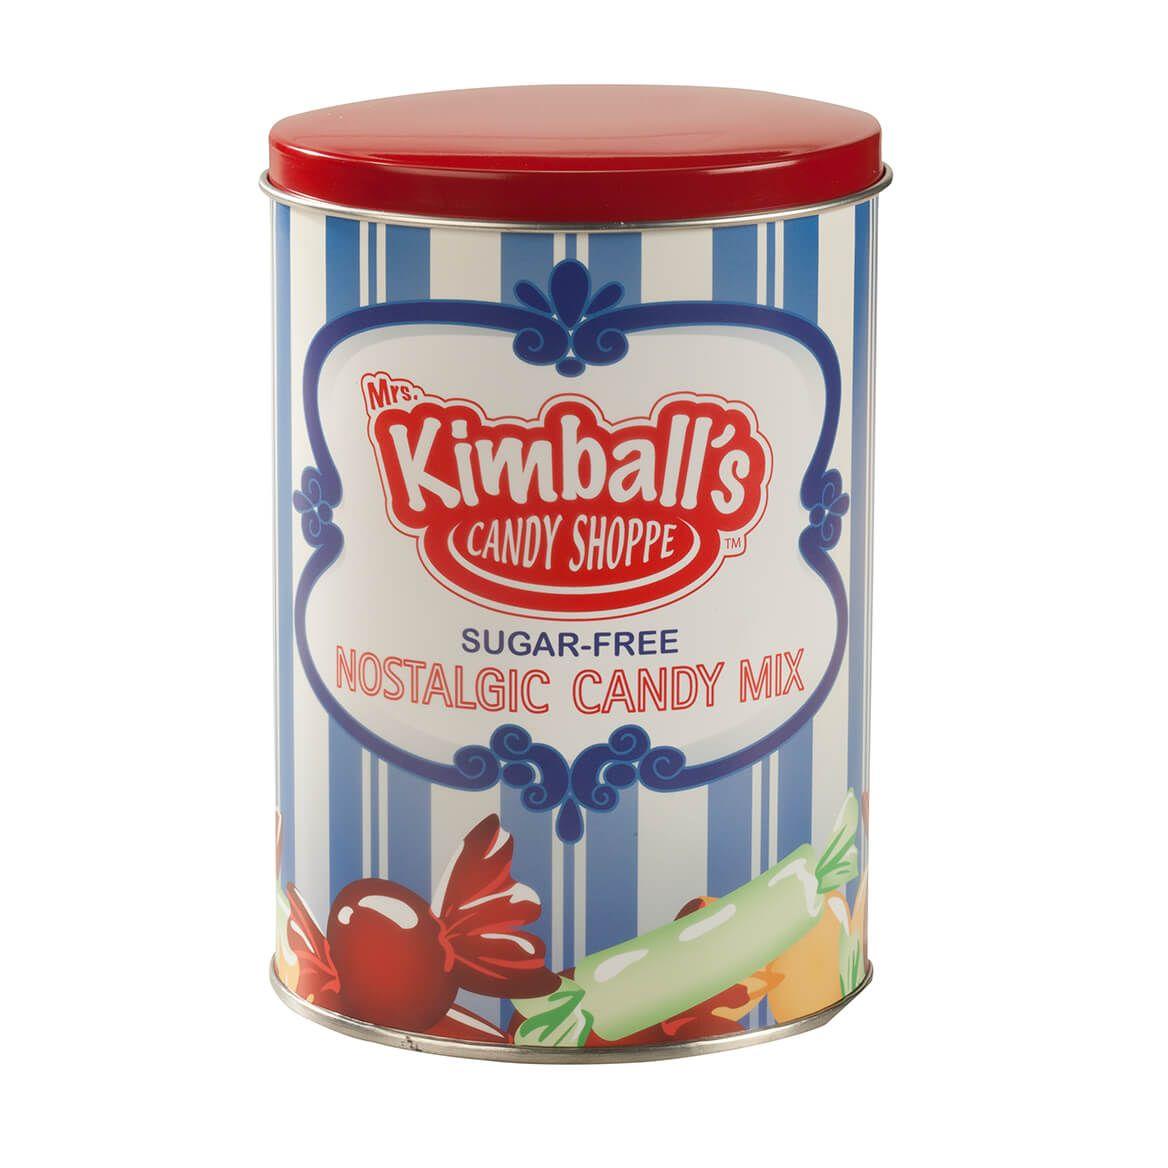 Sugar-Free Nostalgic Candy Tin by Mrs. Kimball's Candy Shopp-364291